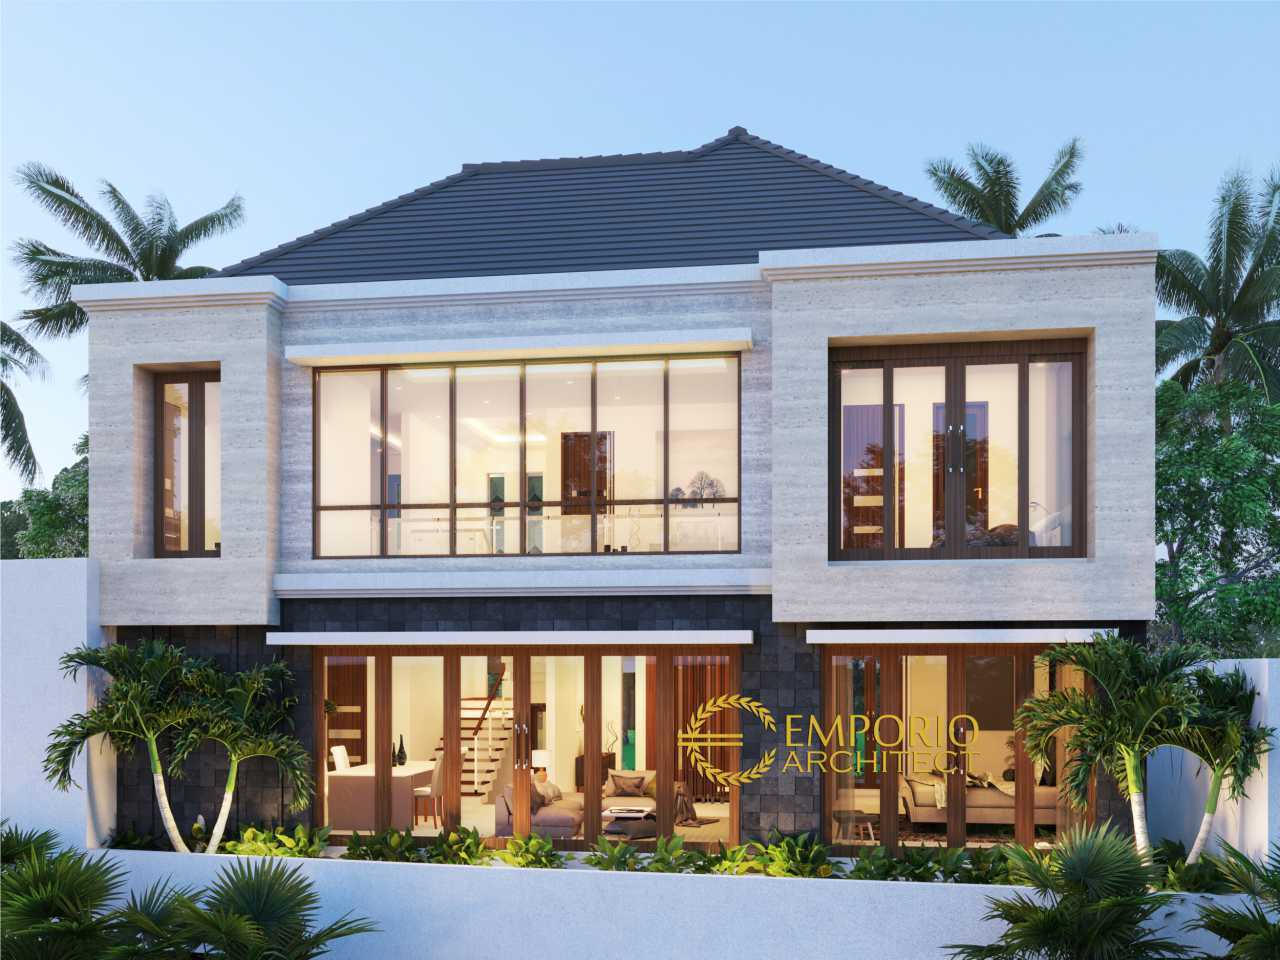 Emporio Architect Jasa Arsitek Denpasar Desain Rumah Modern 2 Lantai 774 @ Denpasar, Bali Kota Denpasar, Bali, Indonesia Kota Denpasar, Bali, Indonesia Emporio-Architect-Jasa-Arsitek-Denpasar-Desain-Rumah-Modern-2-Lantai-774-Denpasar-Bali  88261